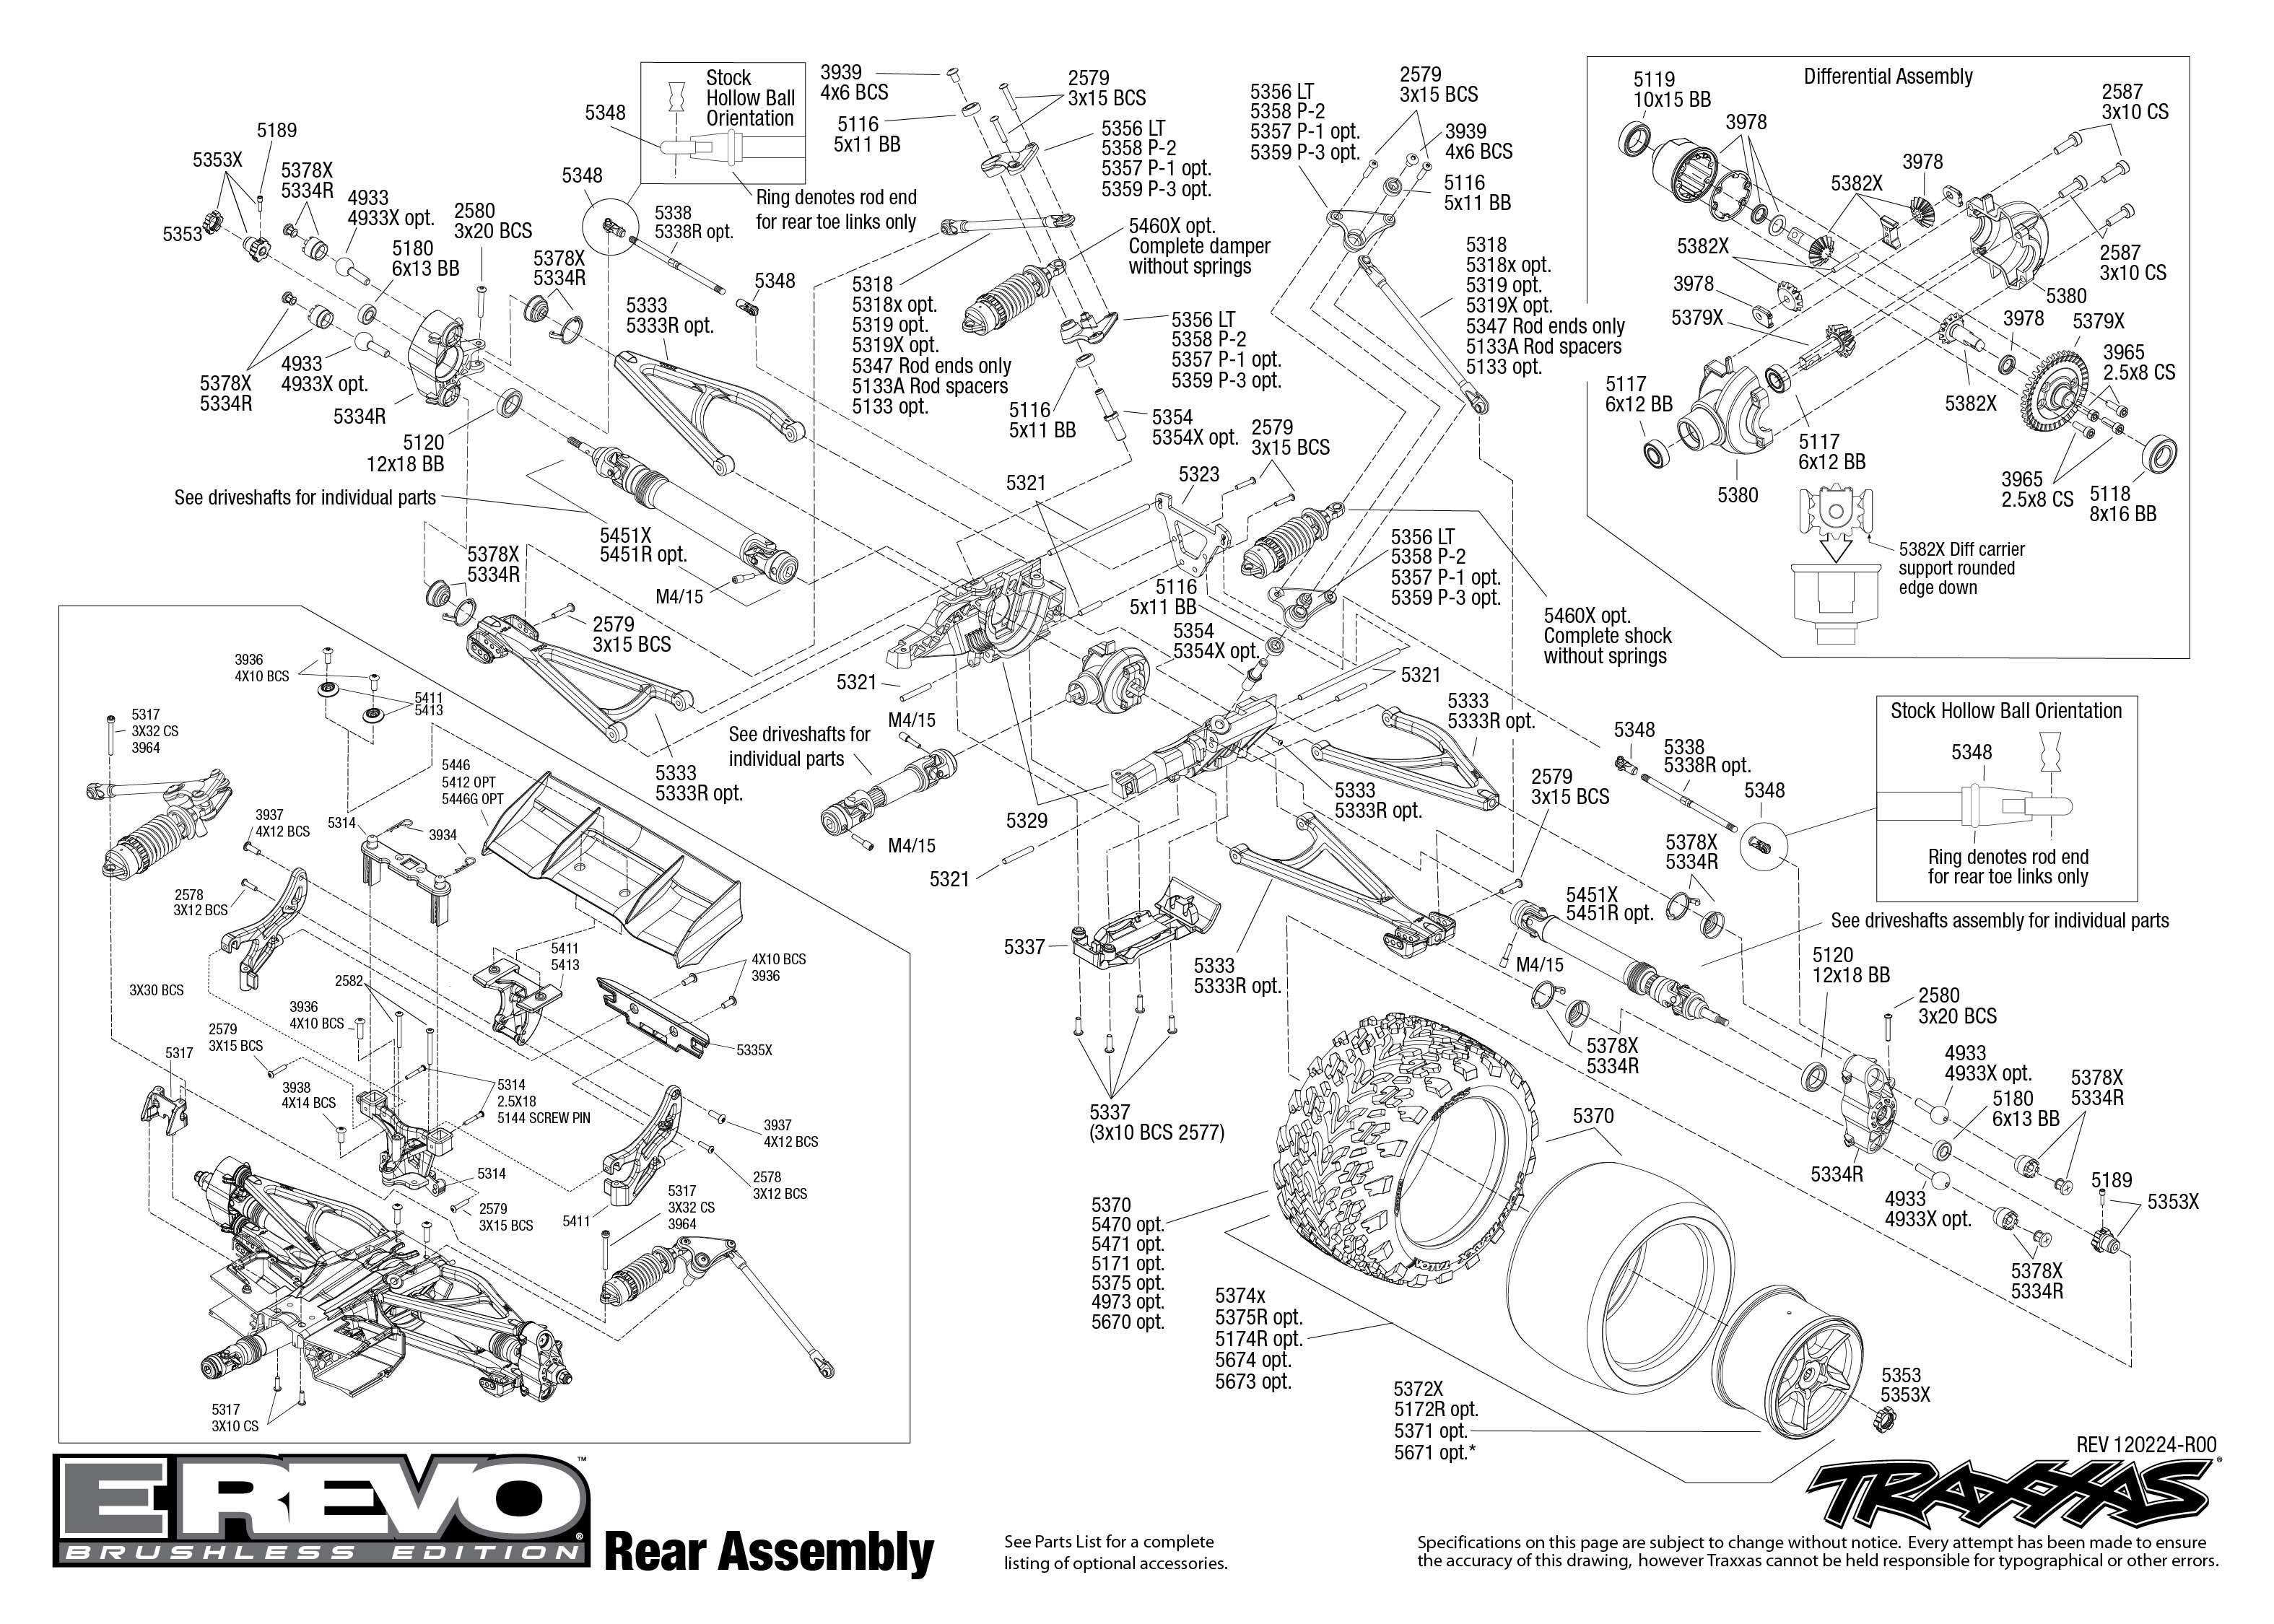 traxxas bouwtekening achterkant e-revo brushless | trxxs ... jato parts diagram ford f 150 parts diagram #11